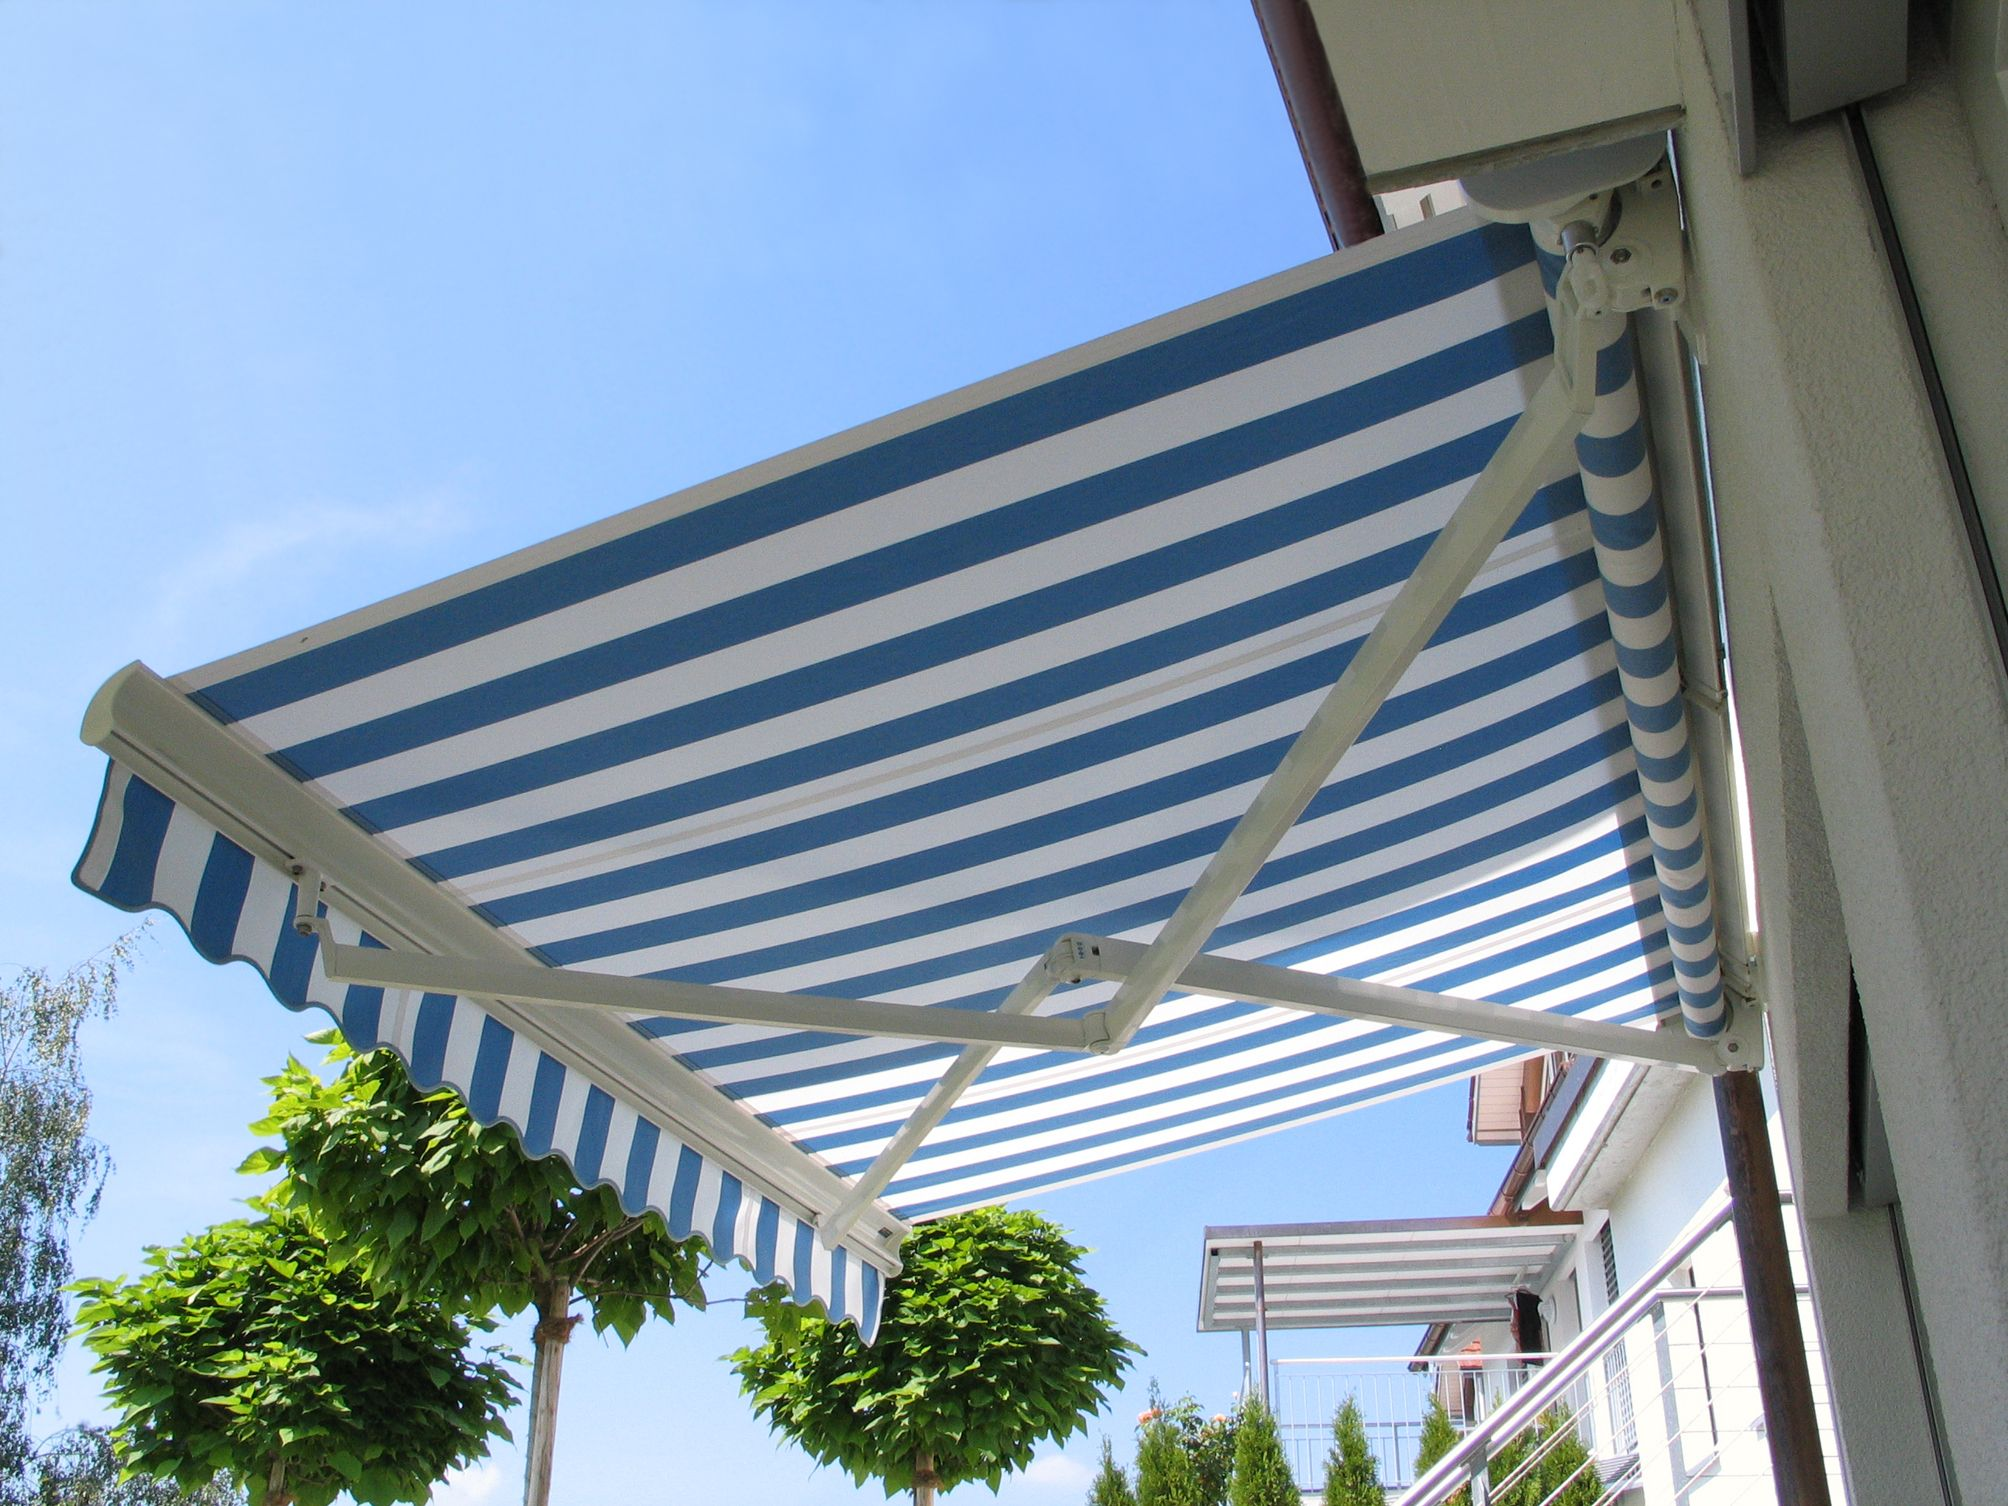 Ausgezeichnet 28 Ideen Fur Terrassengestaltung Dach Ideen - Heimat ...